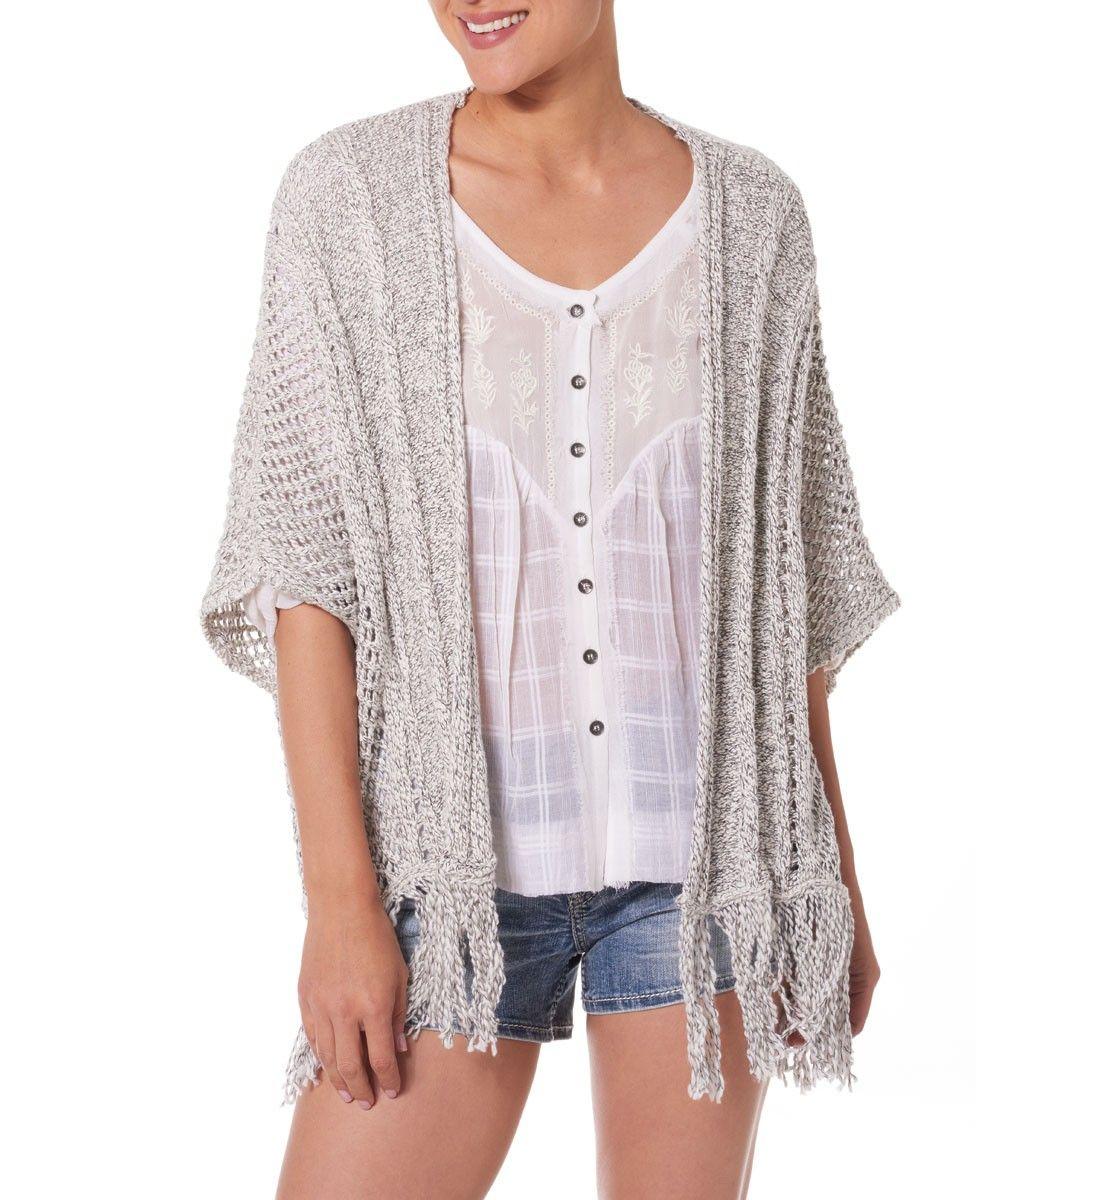 Short-sleeve Cardigan Sweater With Tassel   Kimono style, Short ...